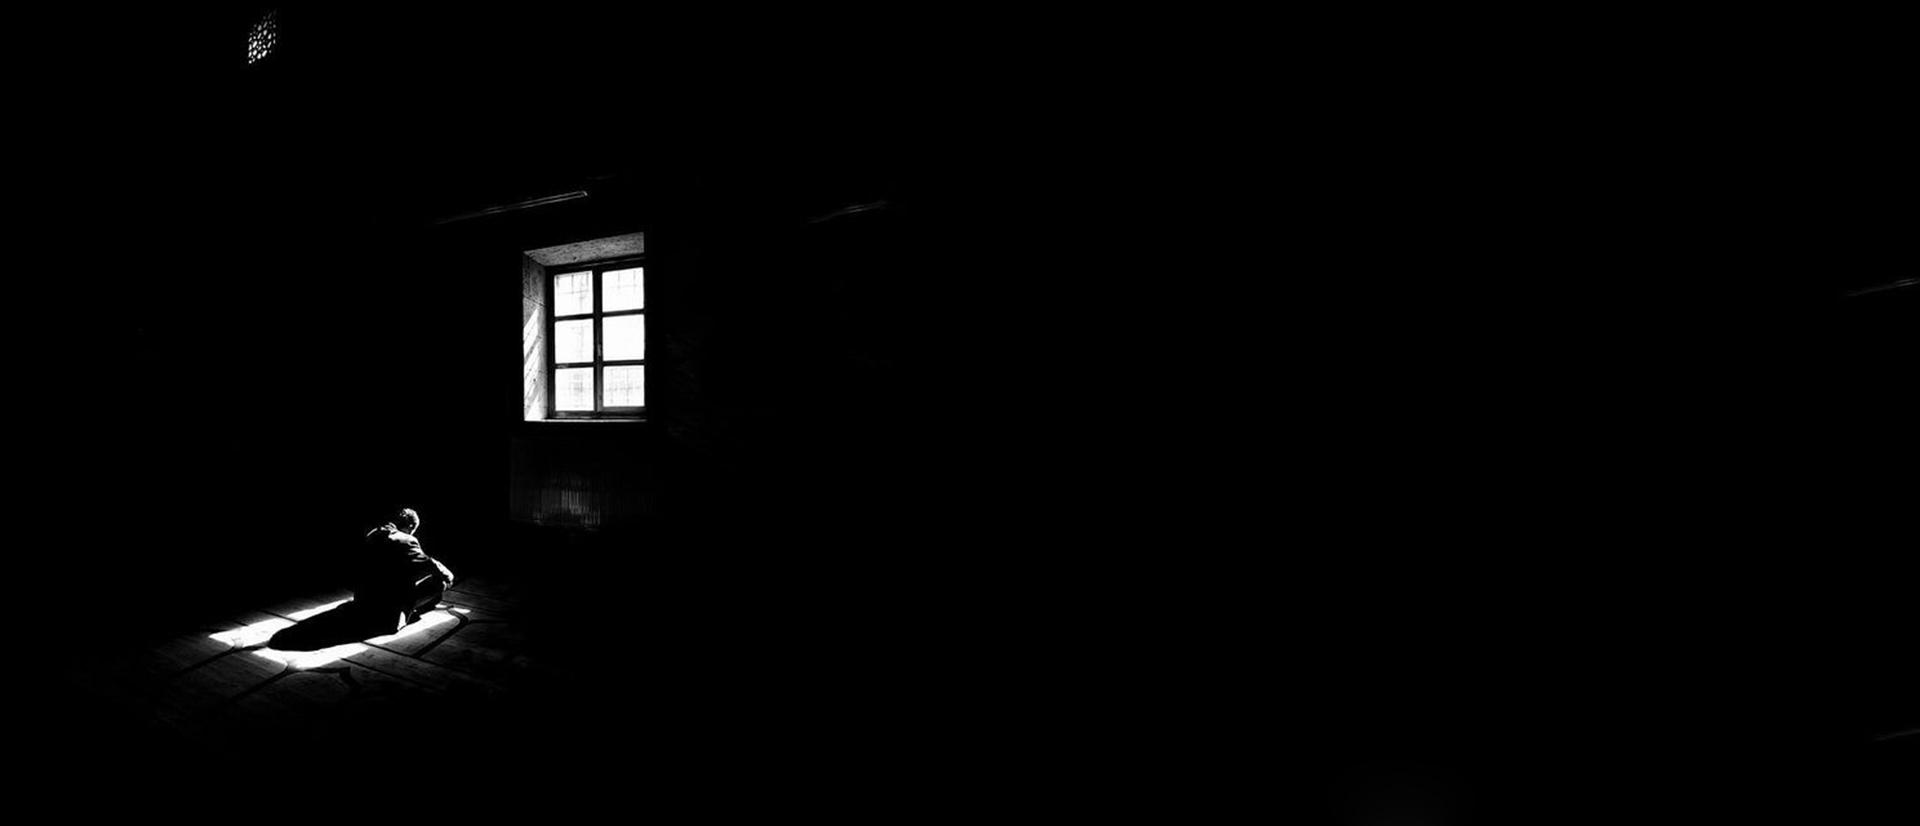 Lonely Black And White Lonely Black And White...